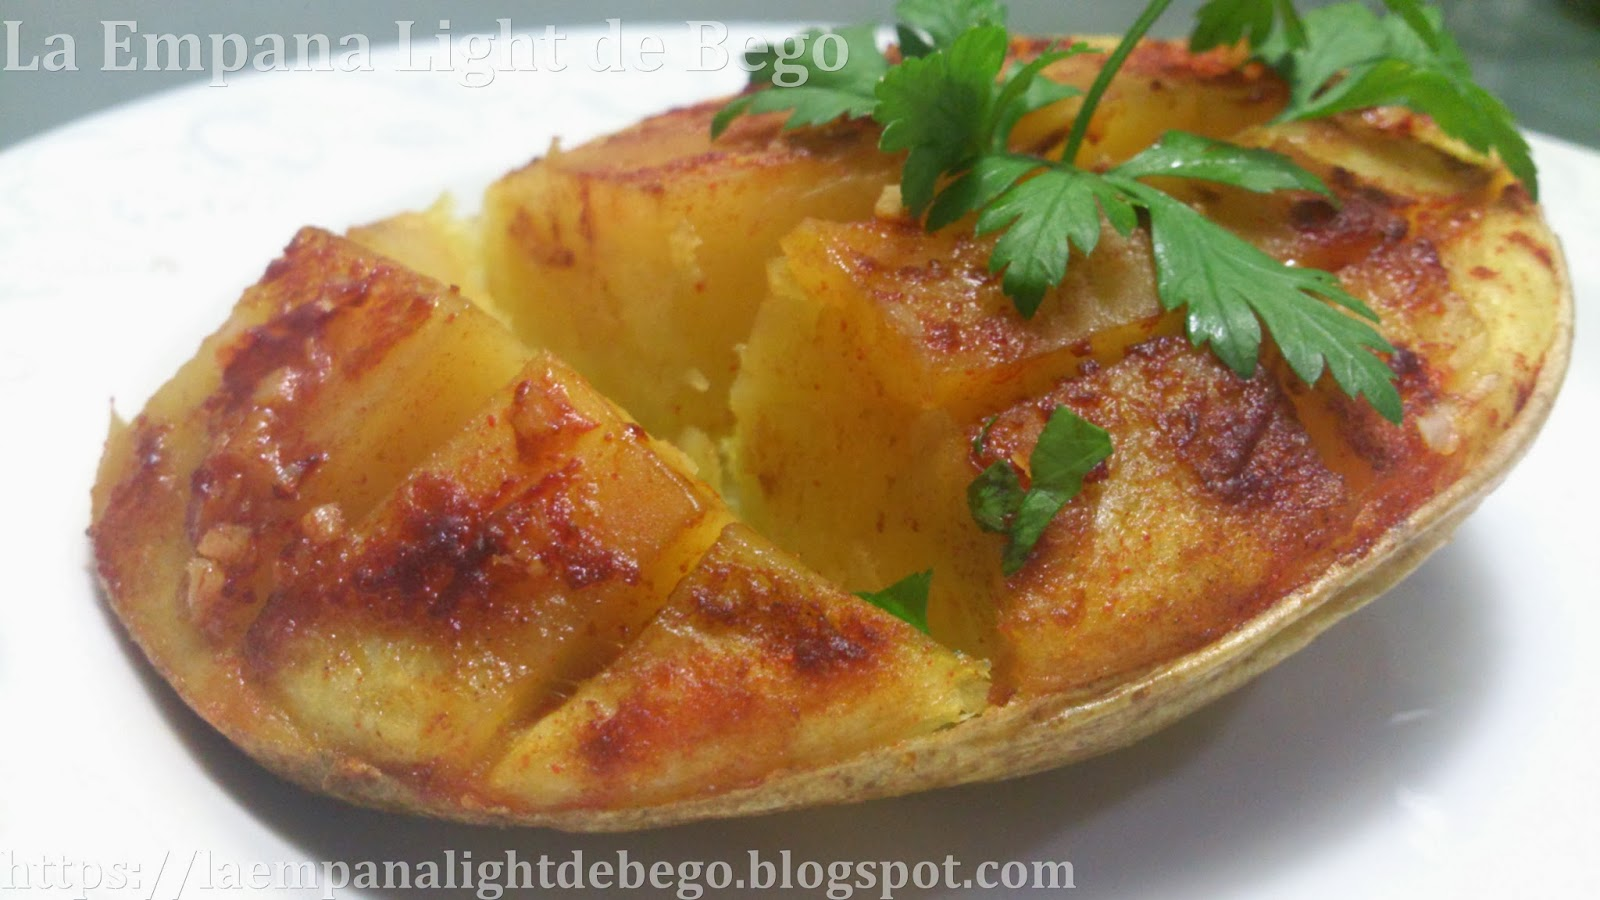 La empana light de bego receta de patatas expr s asadas - Patatas pequenas al horno ...